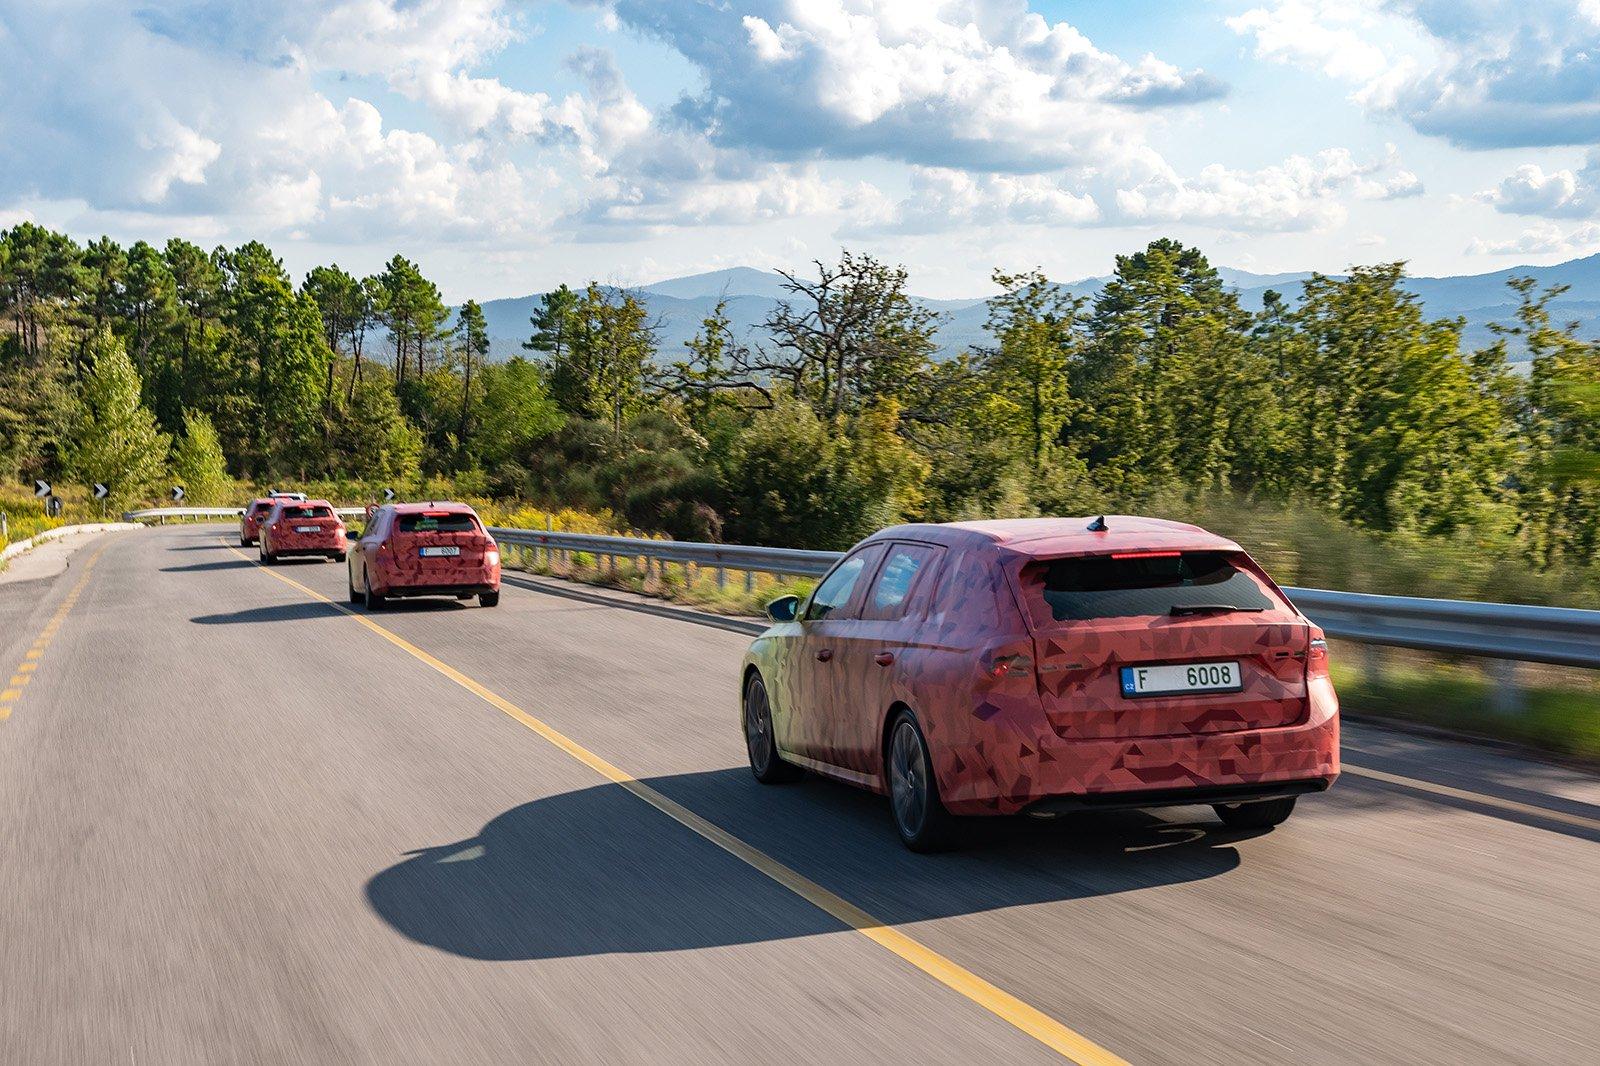 2020 Skoda Octavia covered convoy